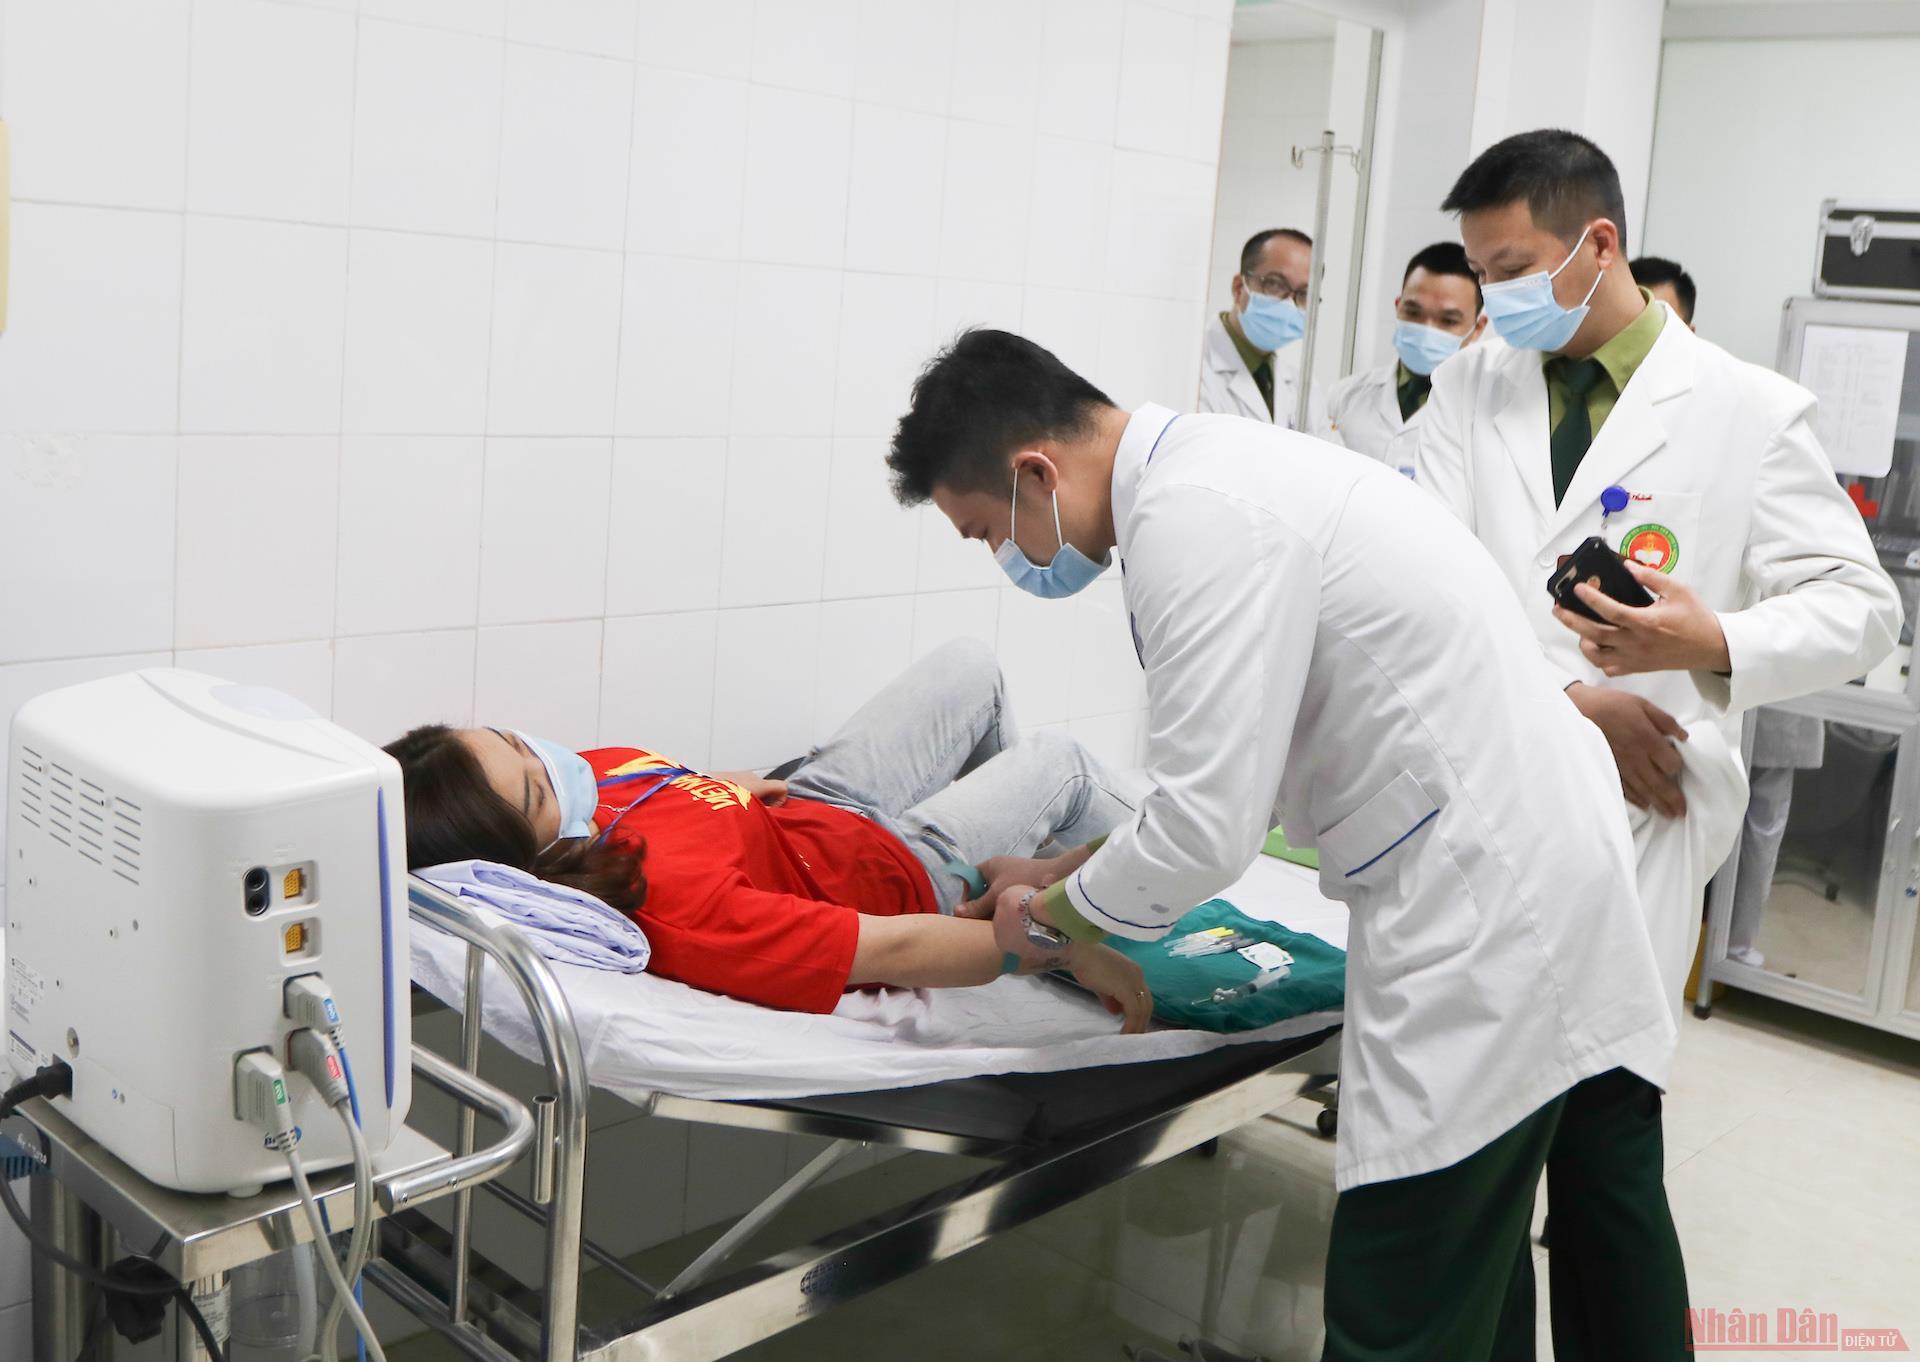 7vaccine_Vietnam_giai_doan_2-1614329235071.JPG